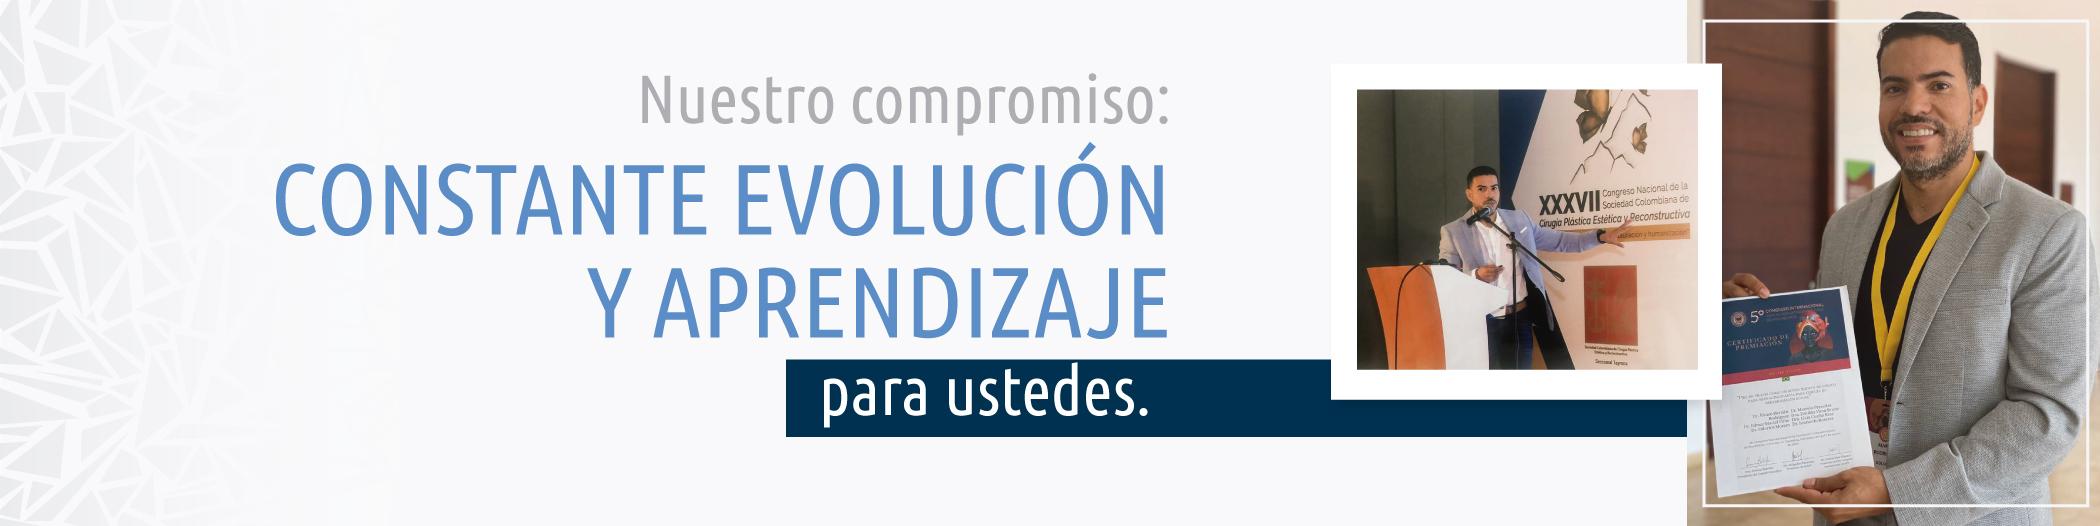 Constante Evolución | CECM Colombia - Dr. Álvaro Hernán Rodriguez